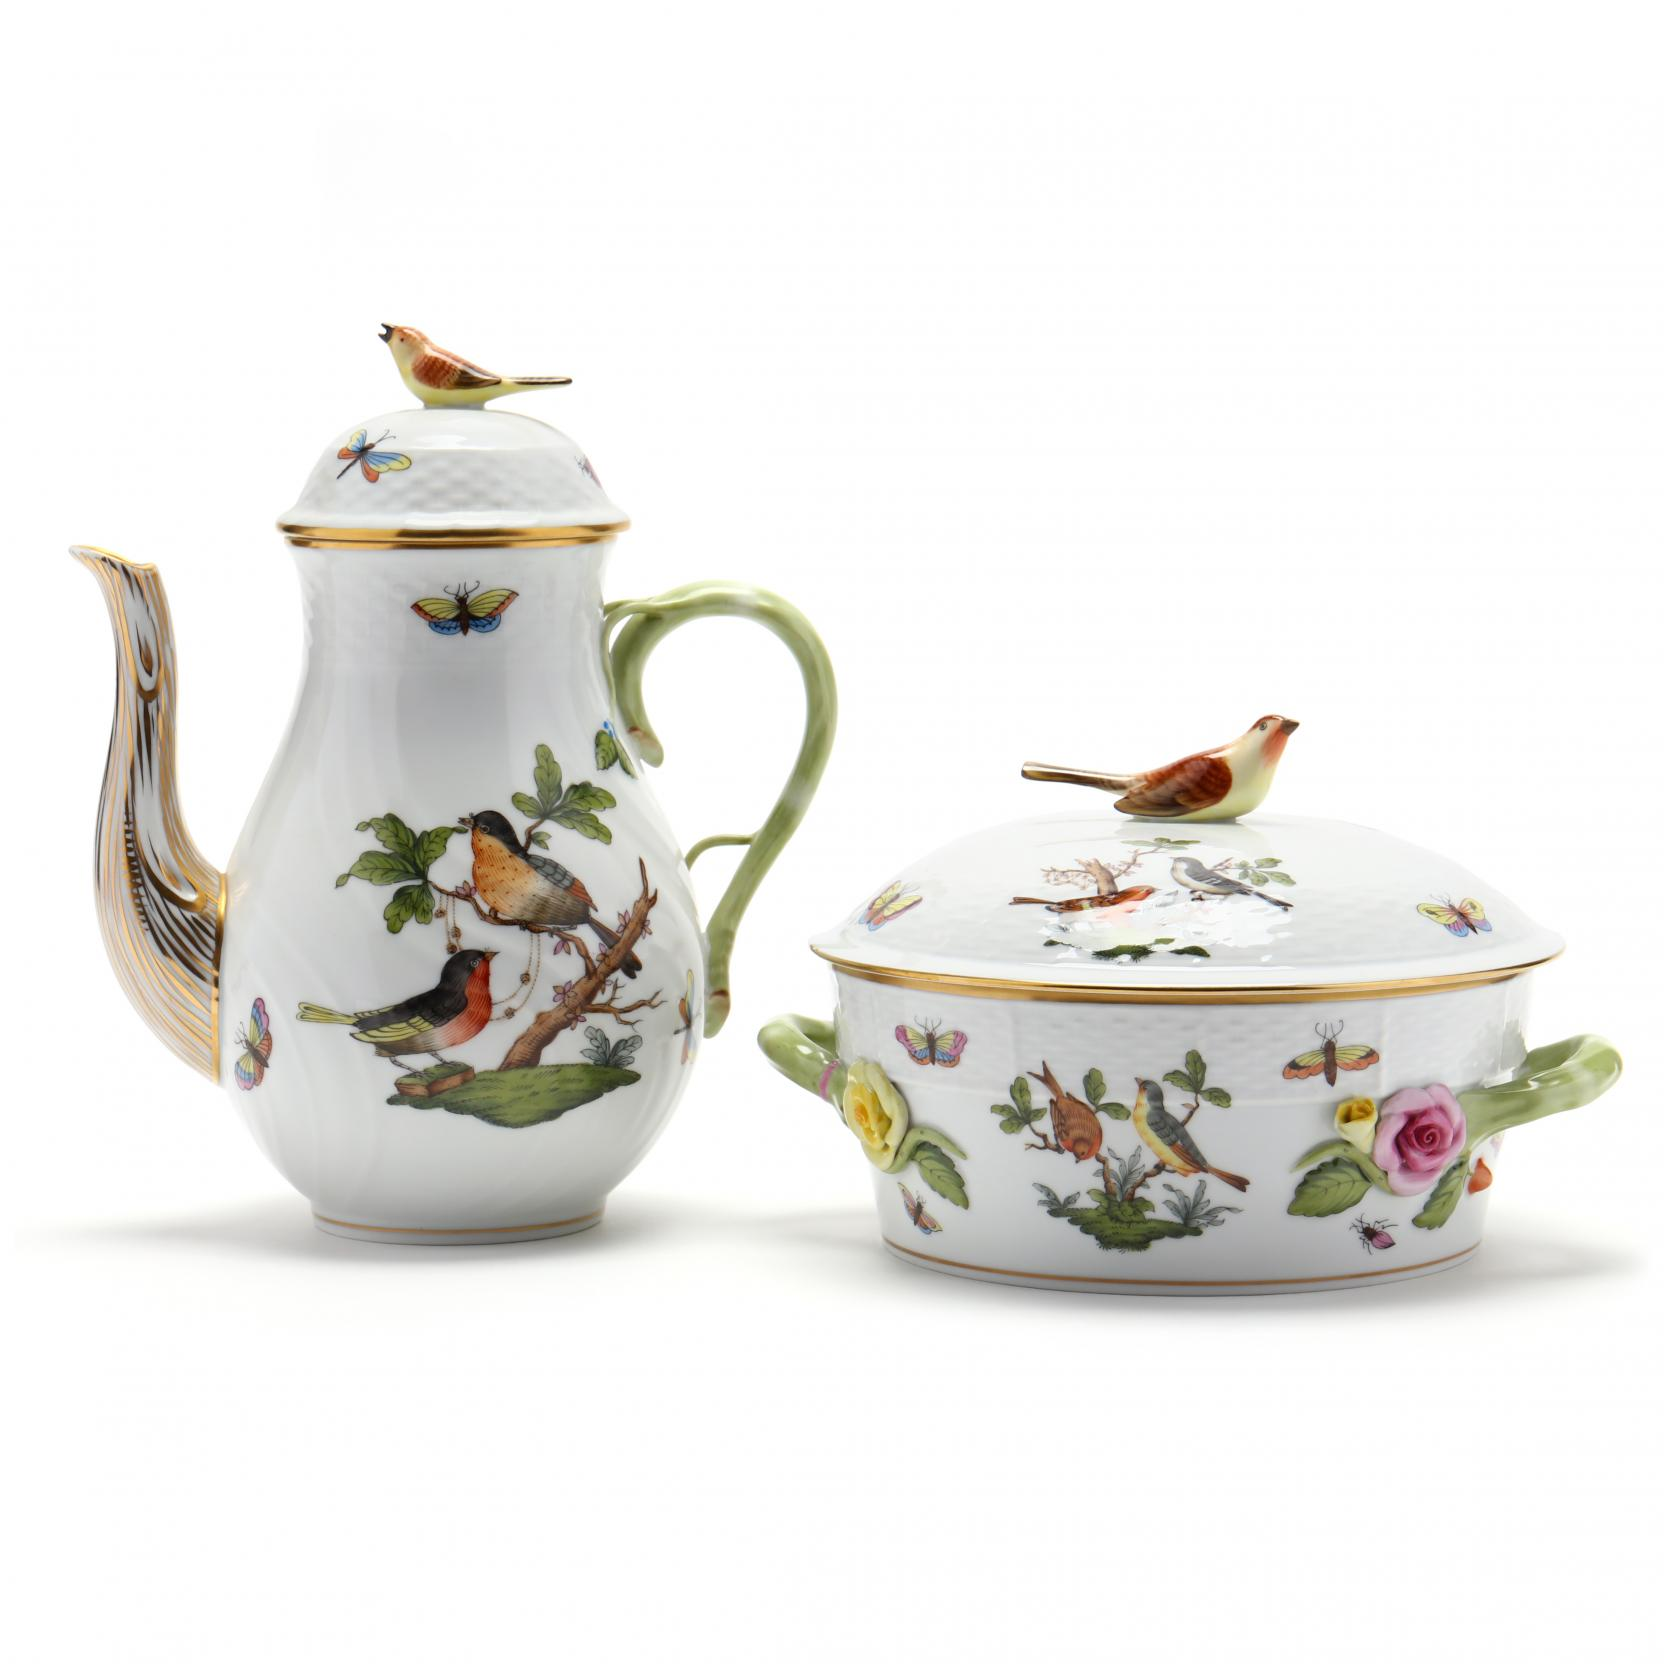 herend-rothschild-bird-coffee-pot-casserole-dish